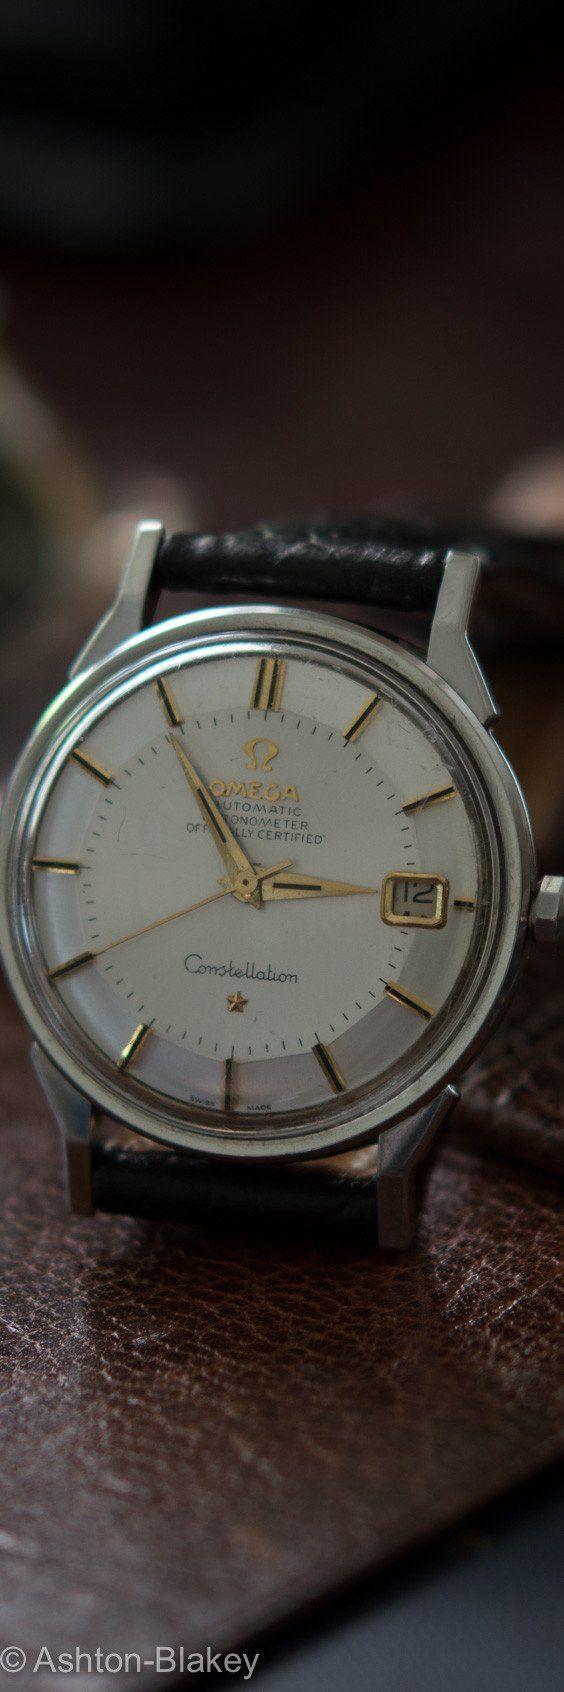 Omega constellation watch #vintage